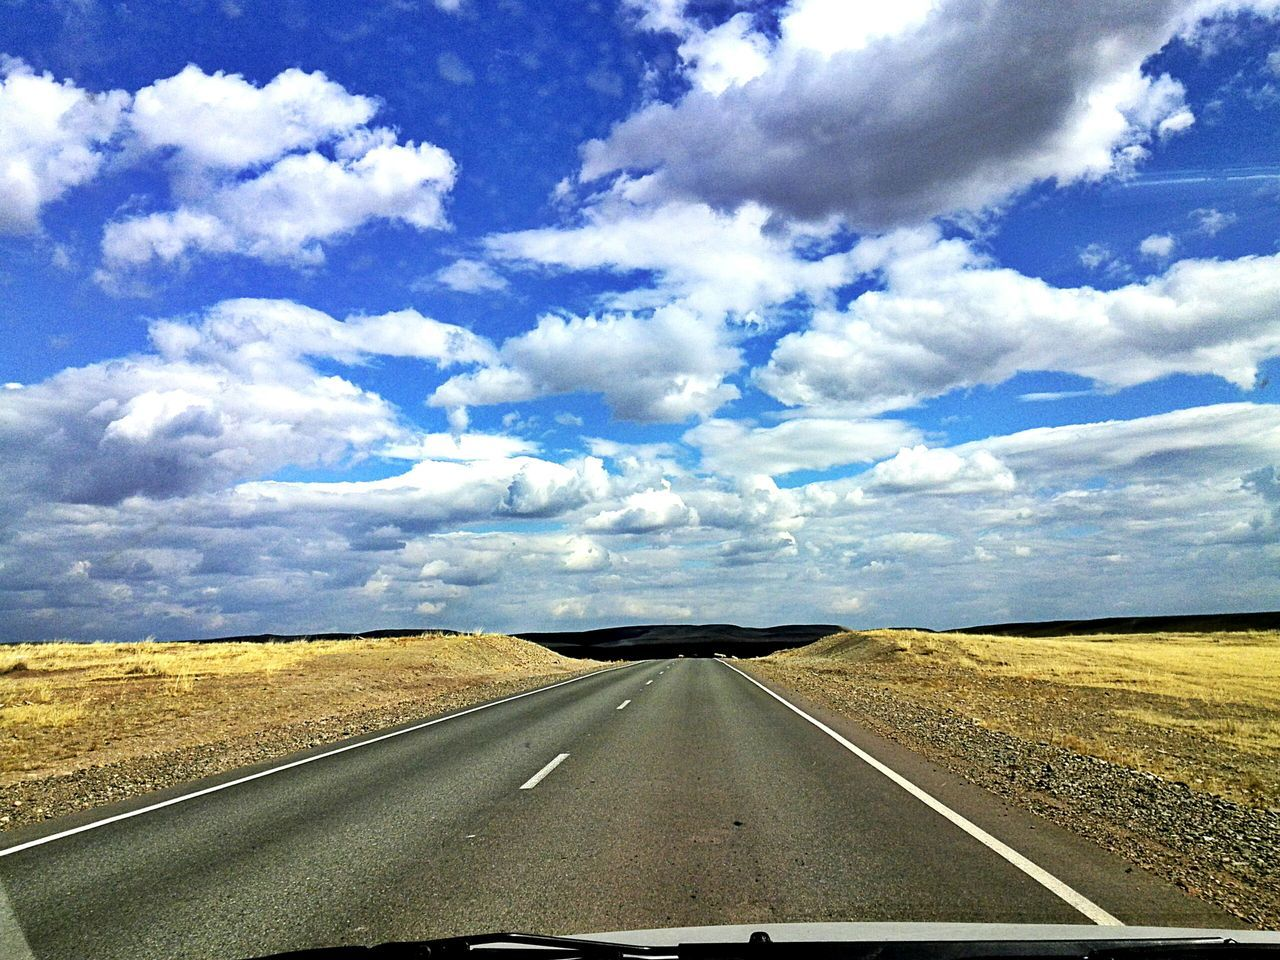 Sky Road Travel Nature Blue Дорога небо⛅️ облака👍 горизонт холмы степь